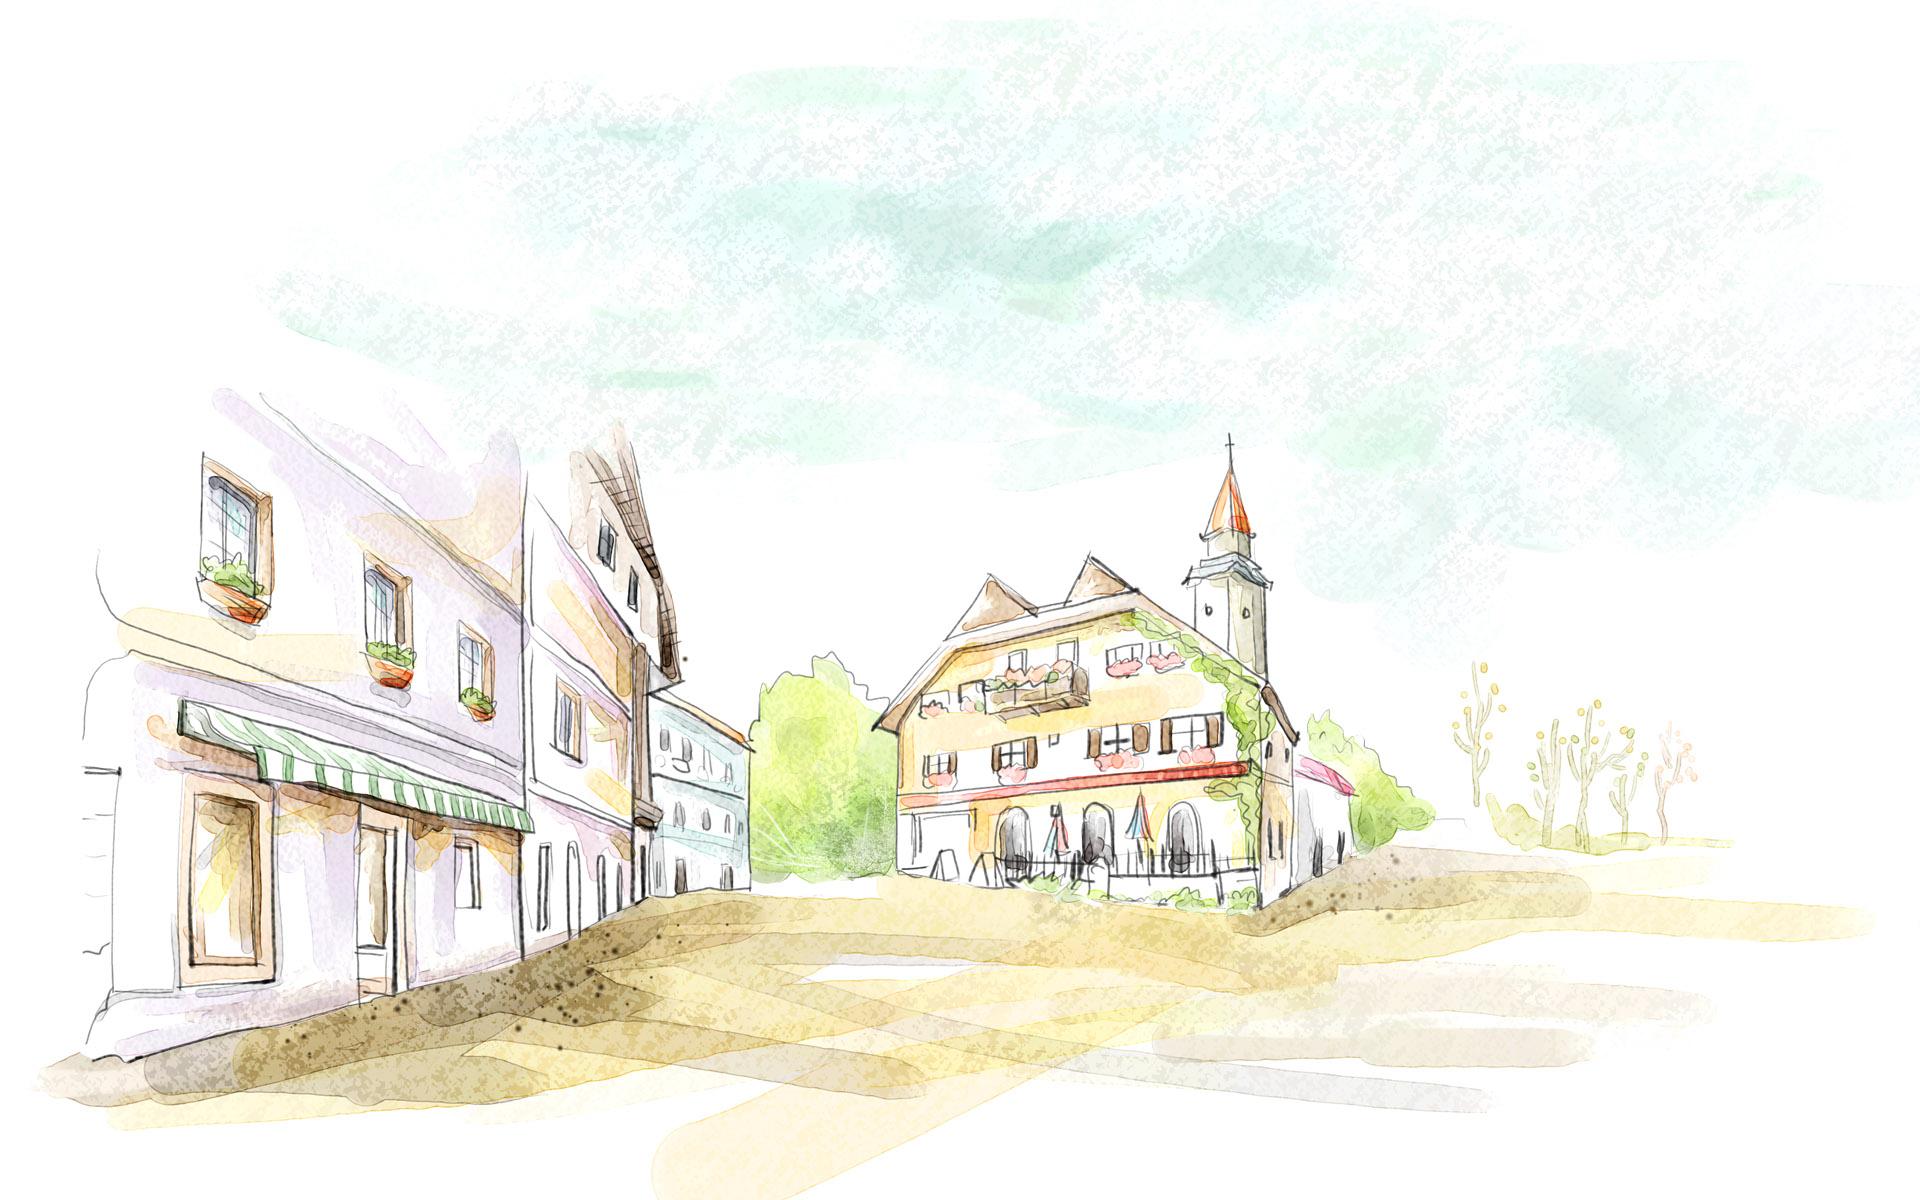 1920x1200 Cartoon Landscape Illustration 18077